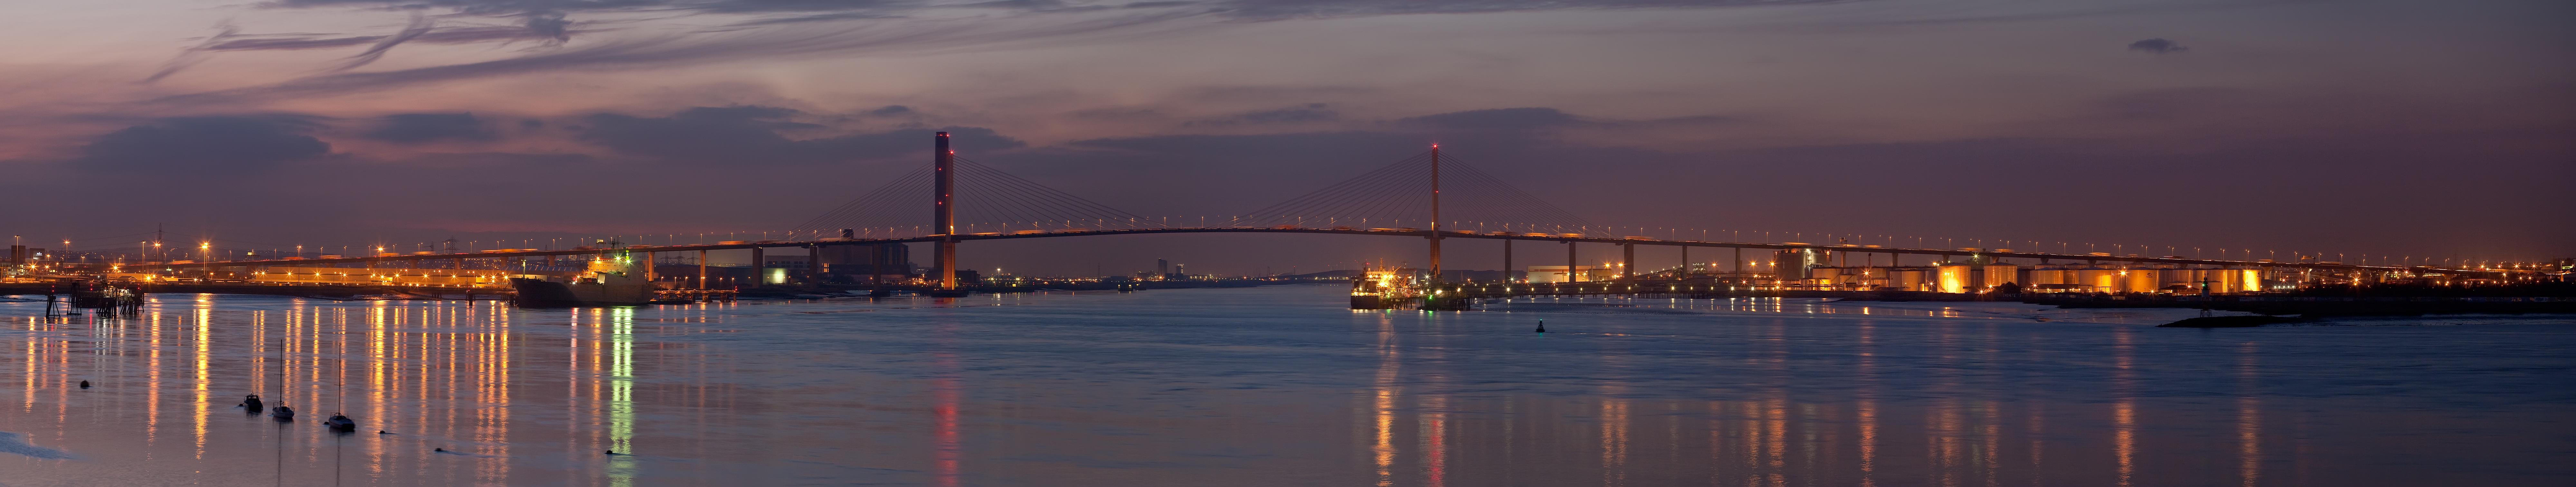 QEII Bridge by night